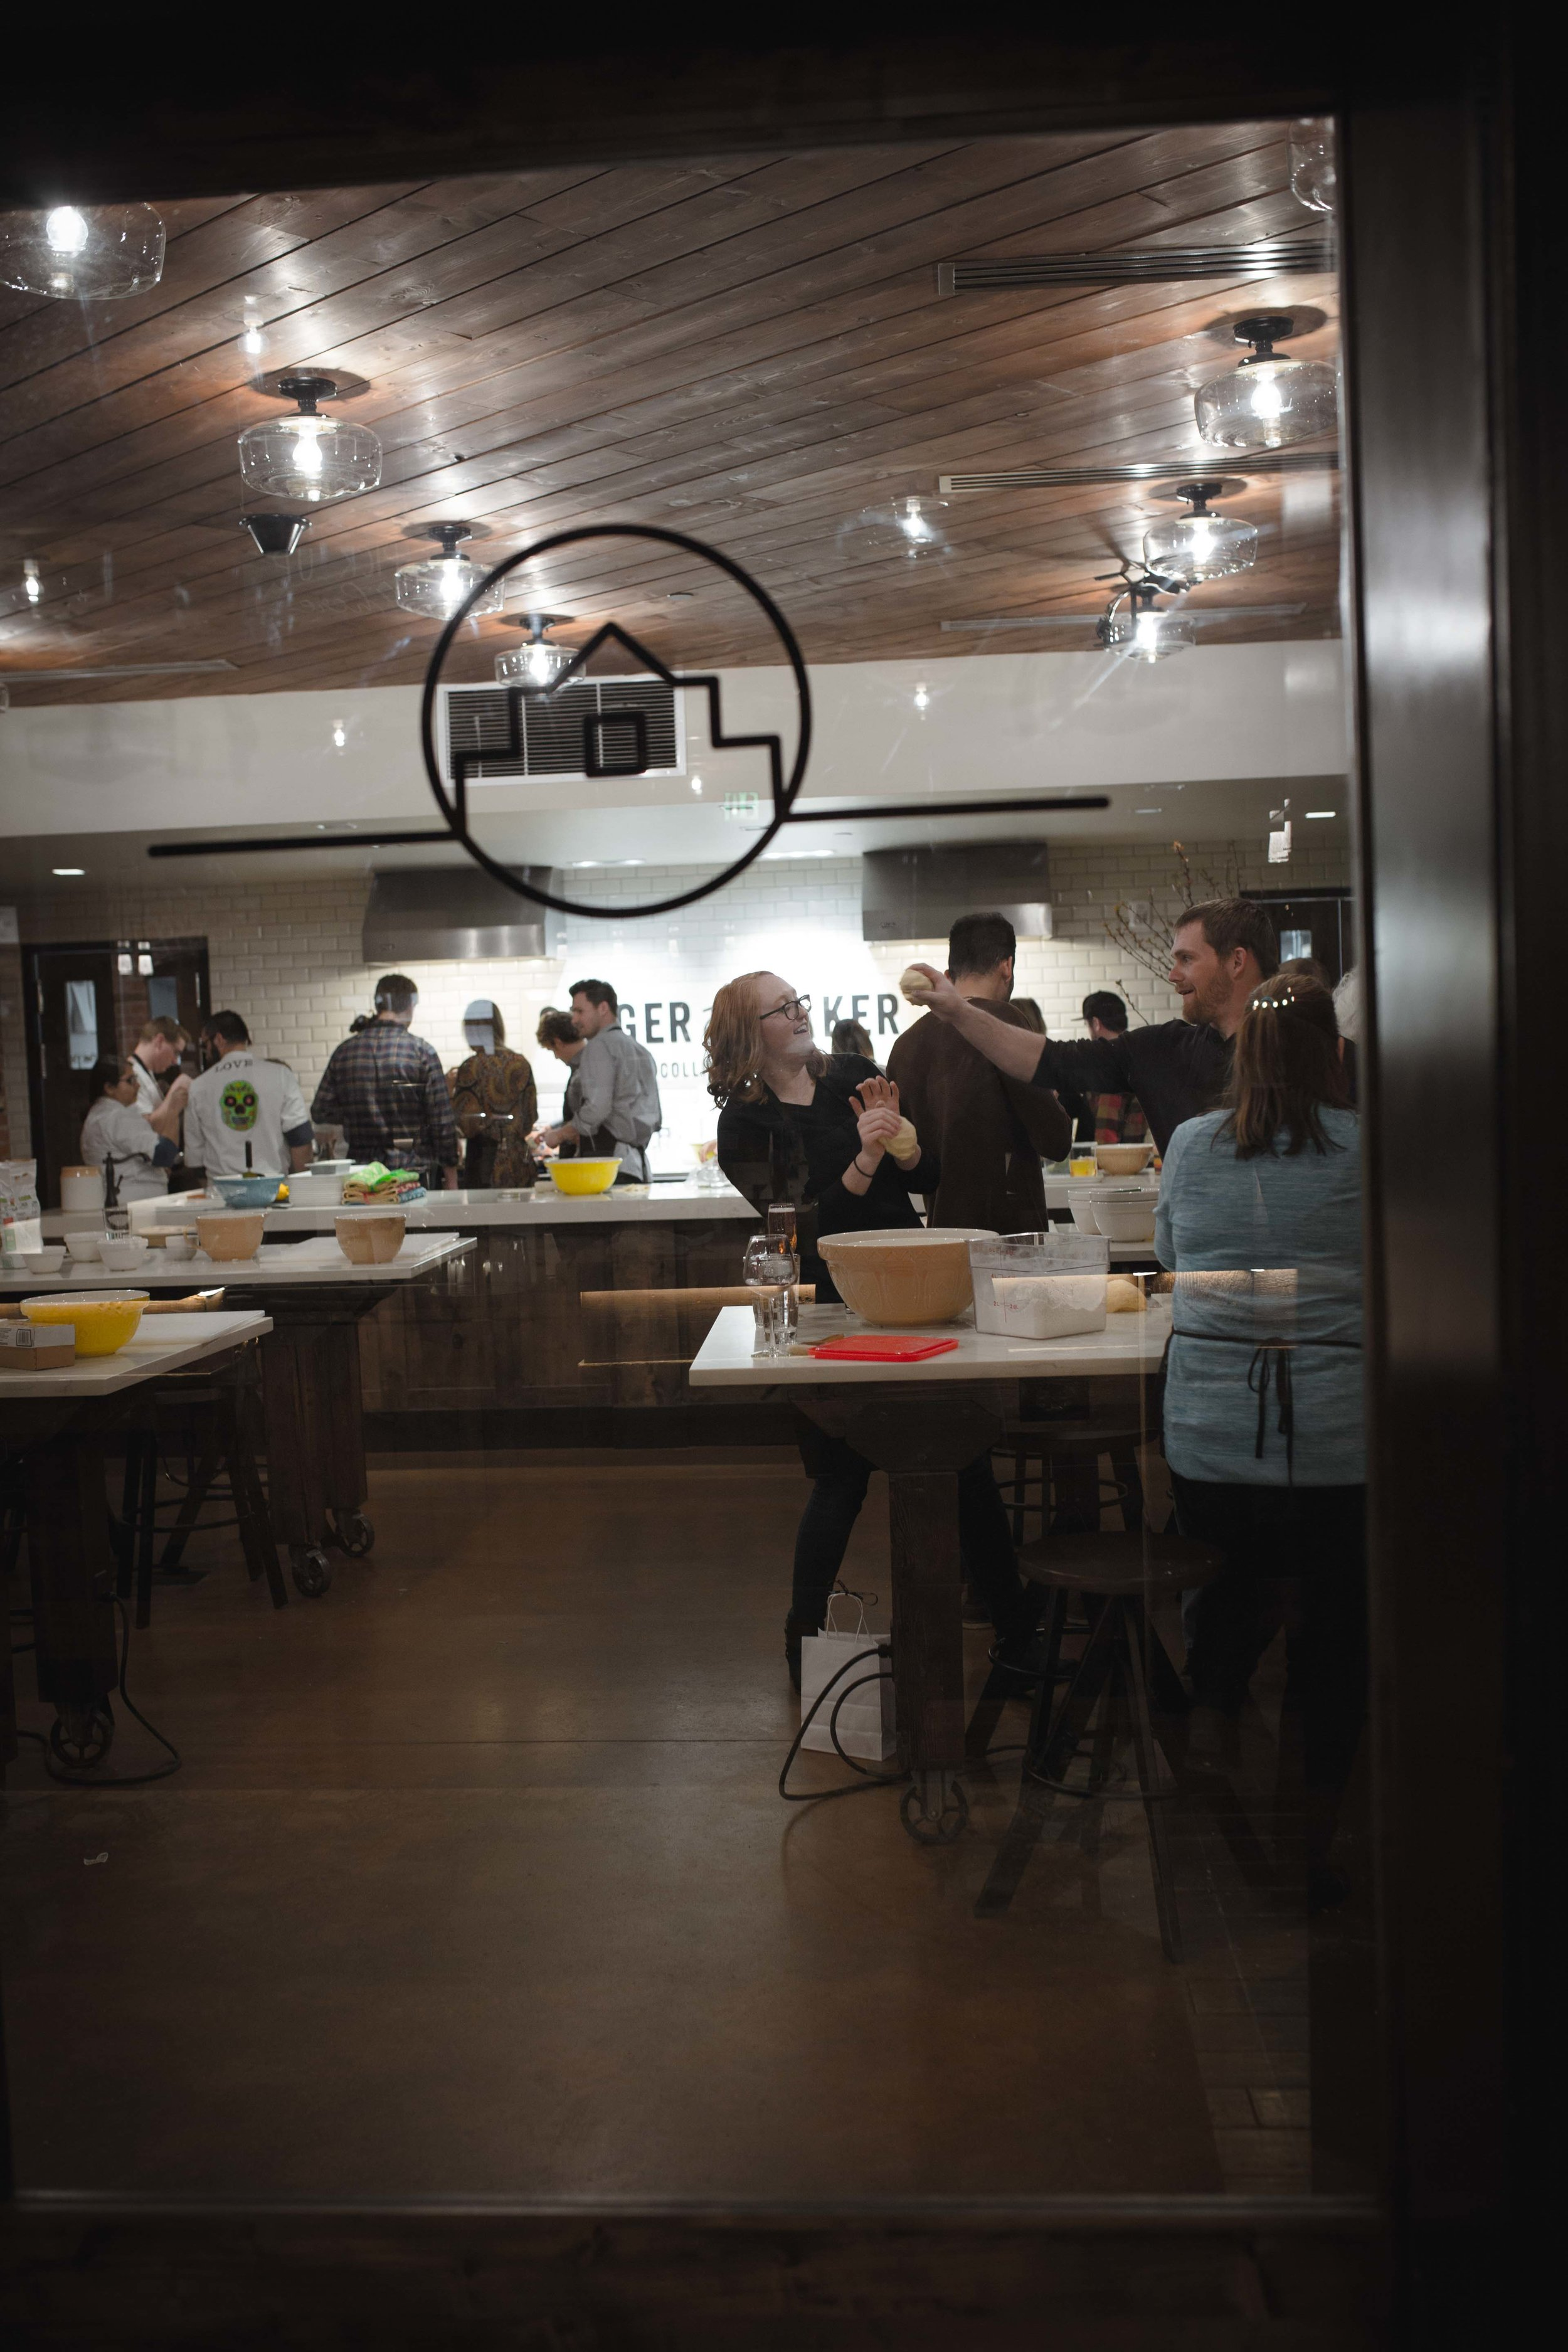 GingerandBaker-JuliyJuan-CookingClass-Feb28-47.jpg